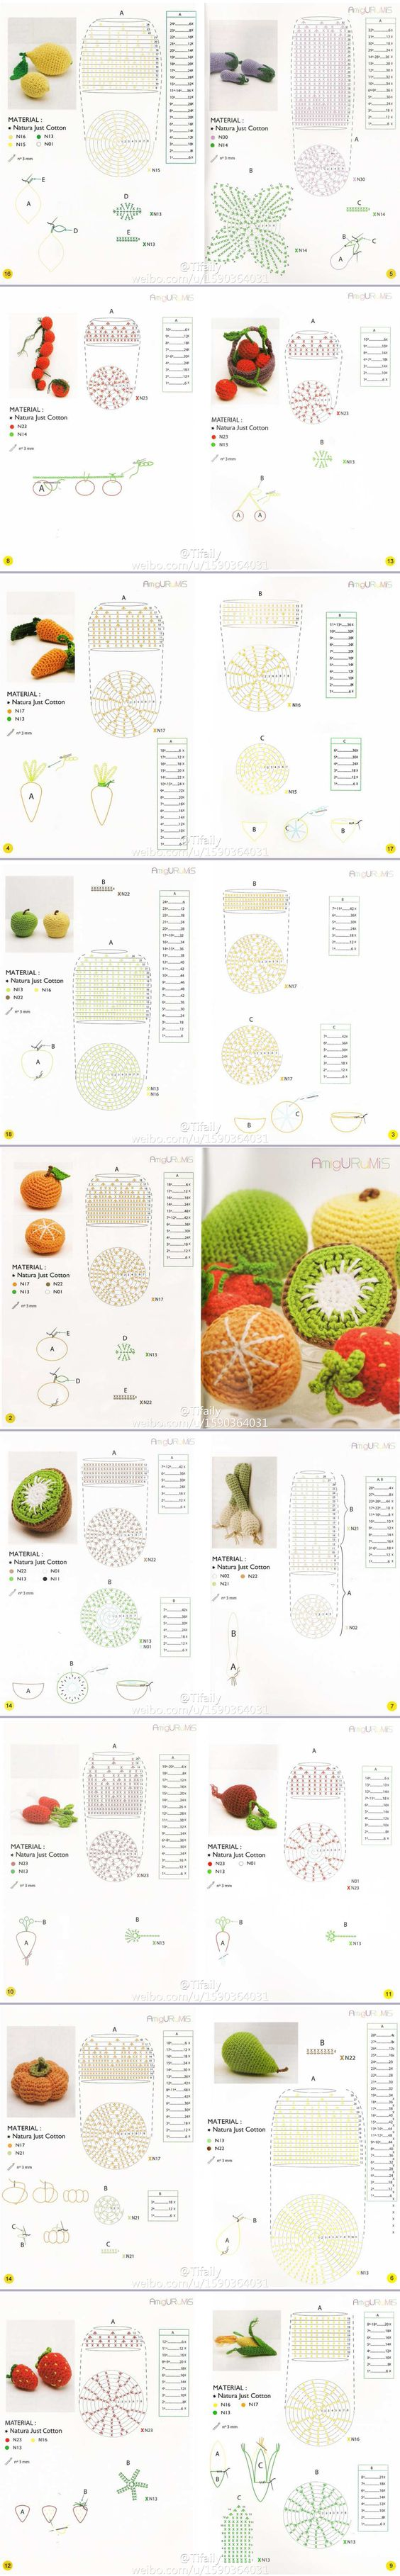 Japanese Amigurumi Chart : Amigurumi Fruits & Vegetables - Chart 4U hilariafina http ...